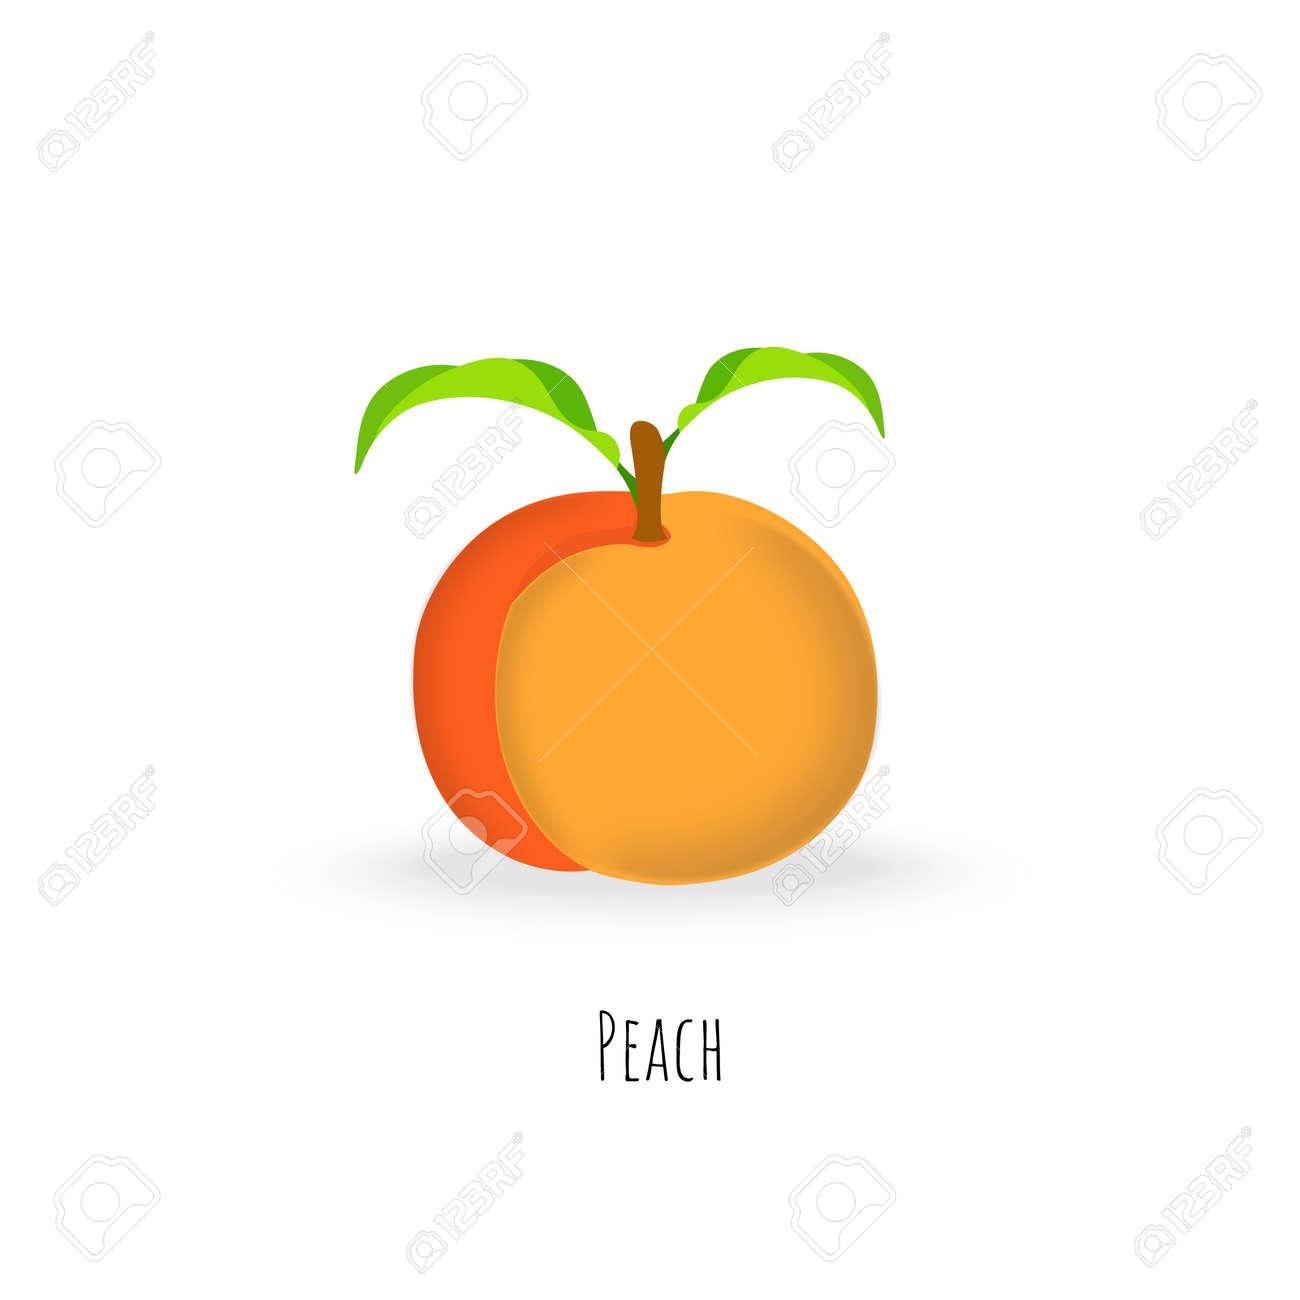 Single peach fruit isolated on white background - 168336279